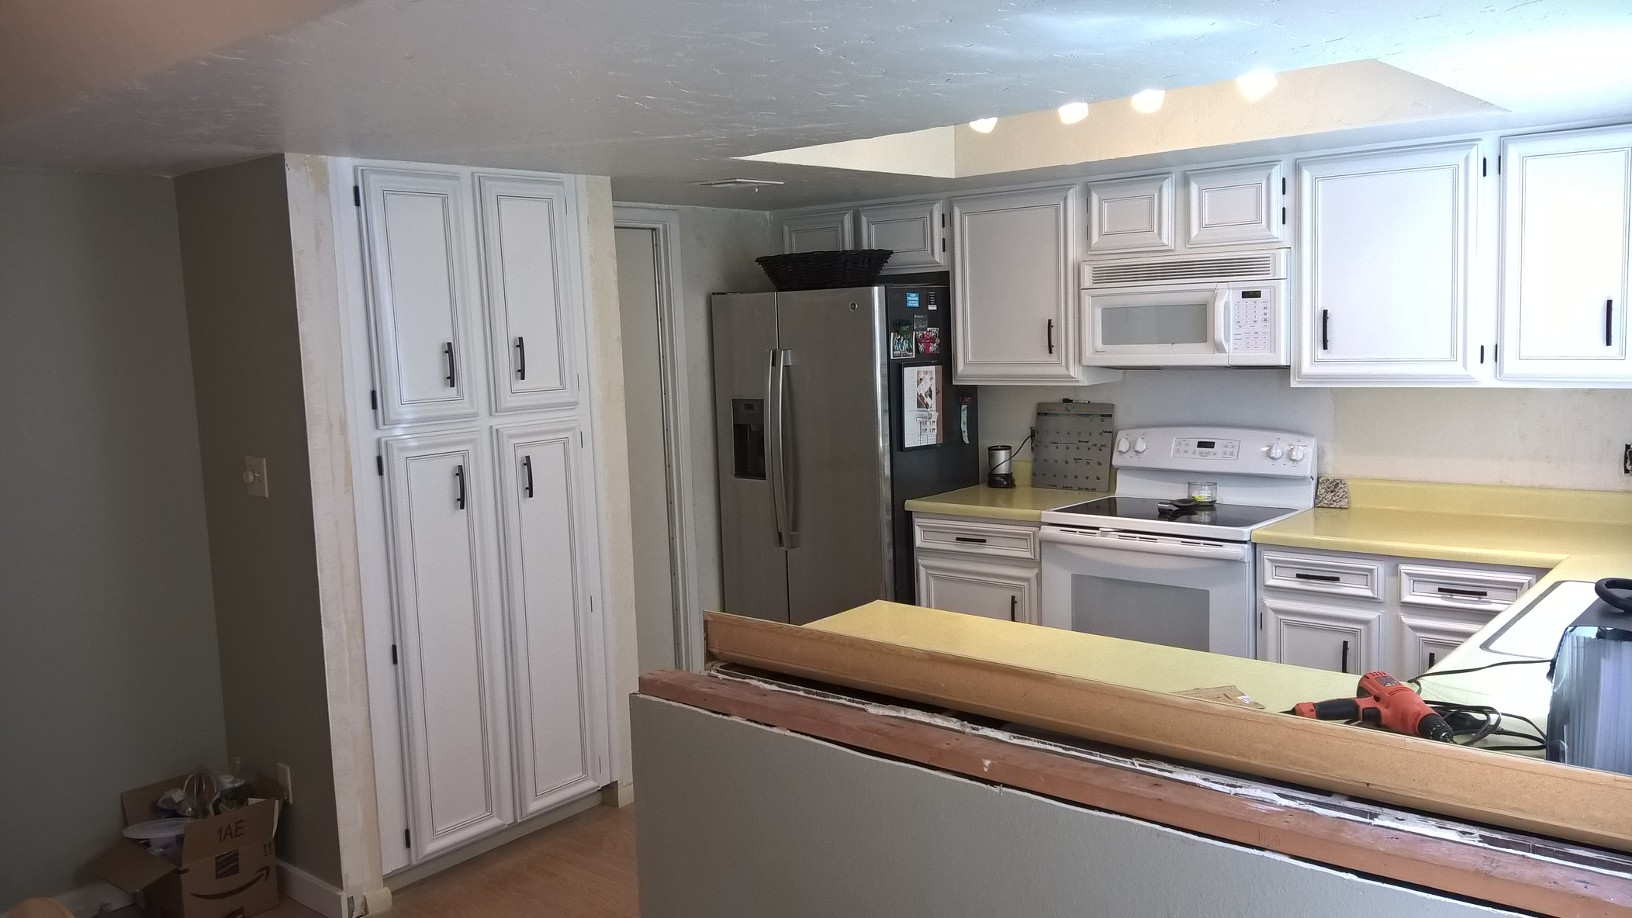 Kitchent In Progress